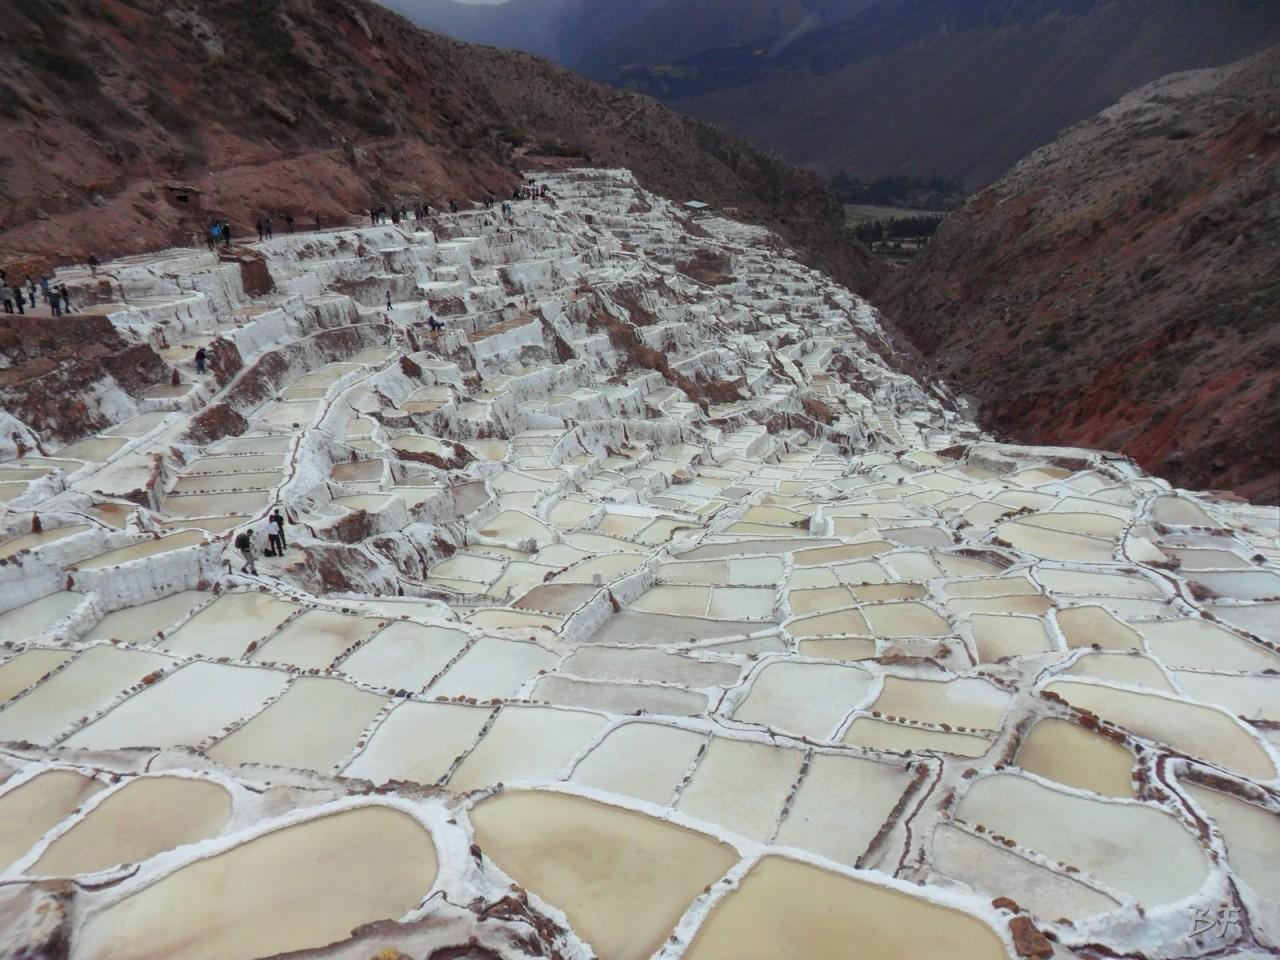 Terrazze-Circolari-Megaliti-Moray-Saline-Maras-Cusco-Perù-11